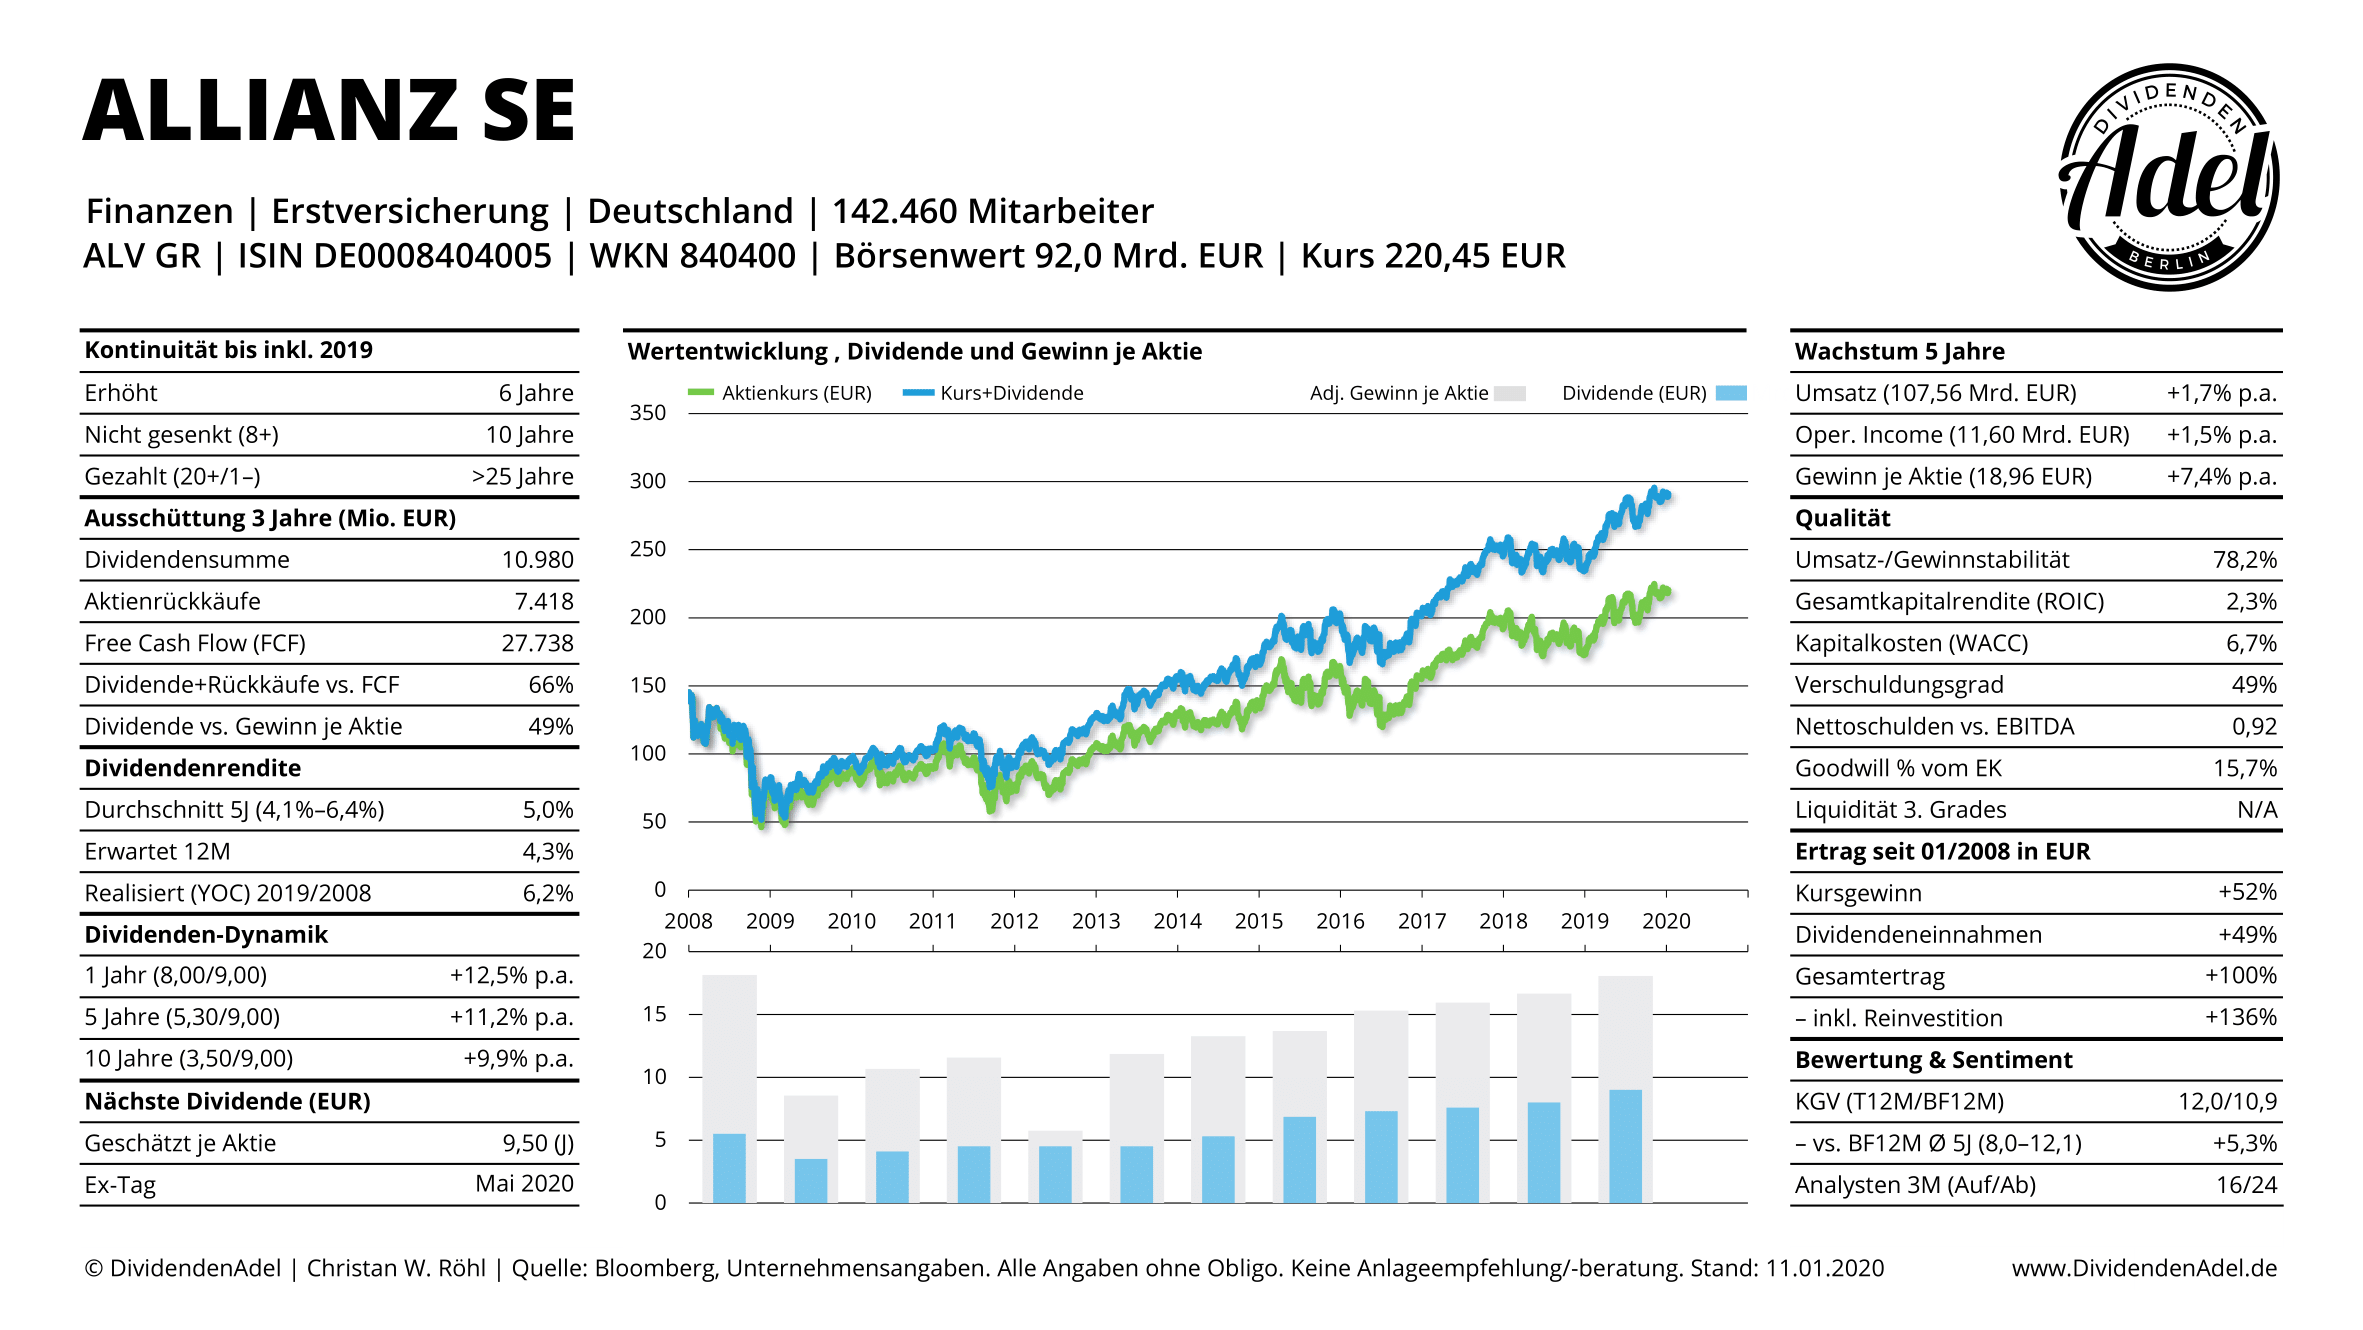 DividendenAdel Eurozone Allianz